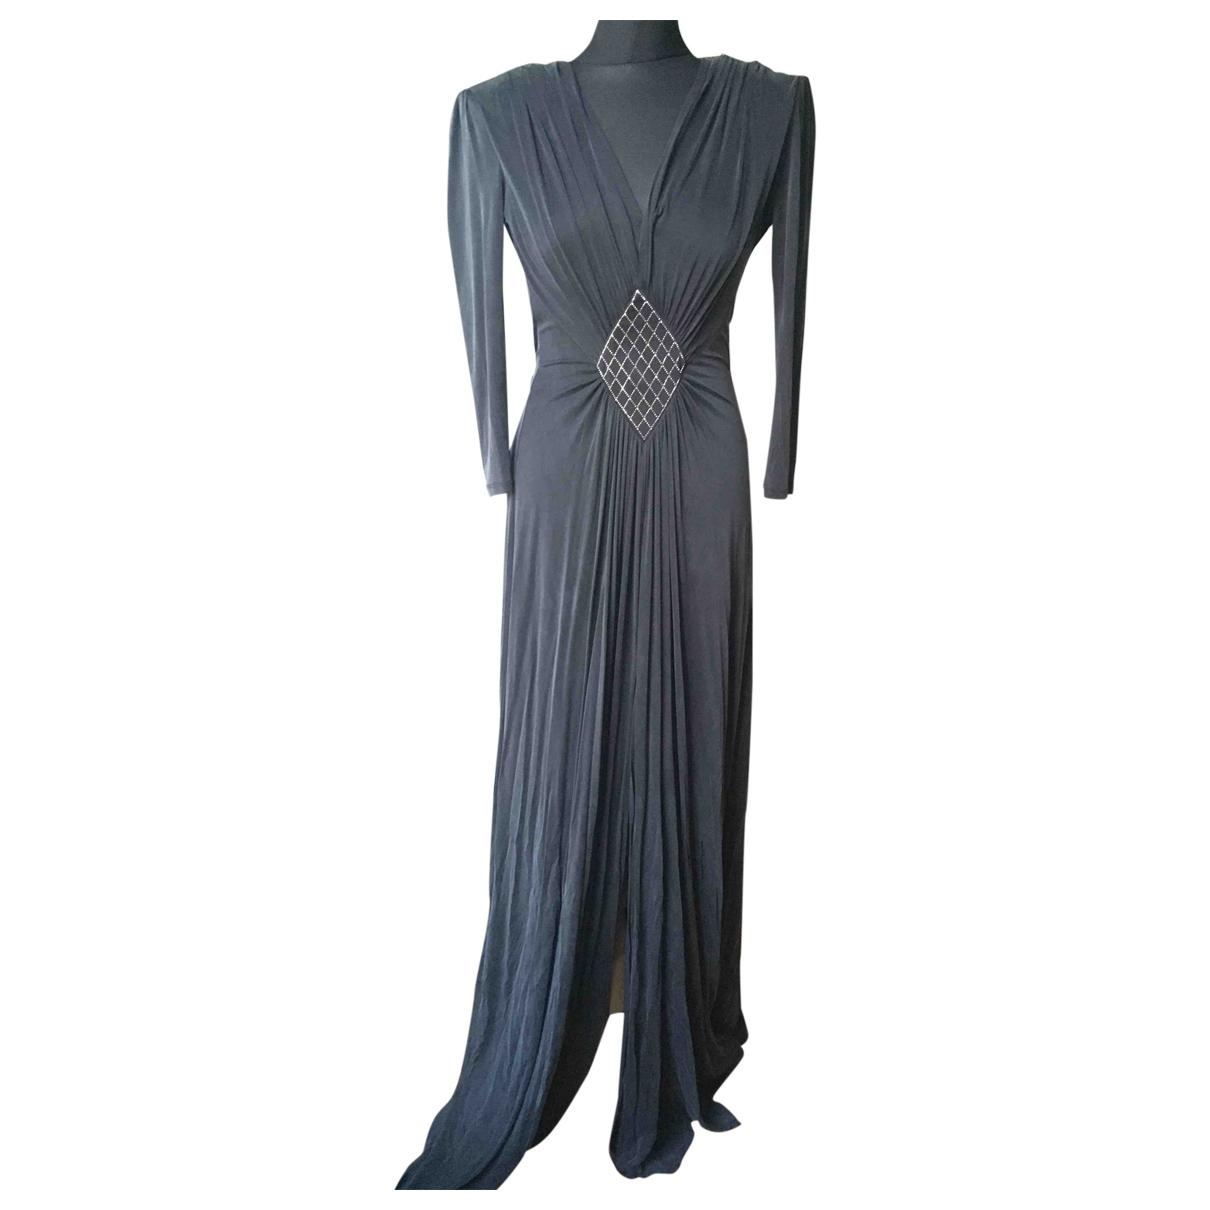 Elisabetta Franchi \N Black dress for Women 42 IT